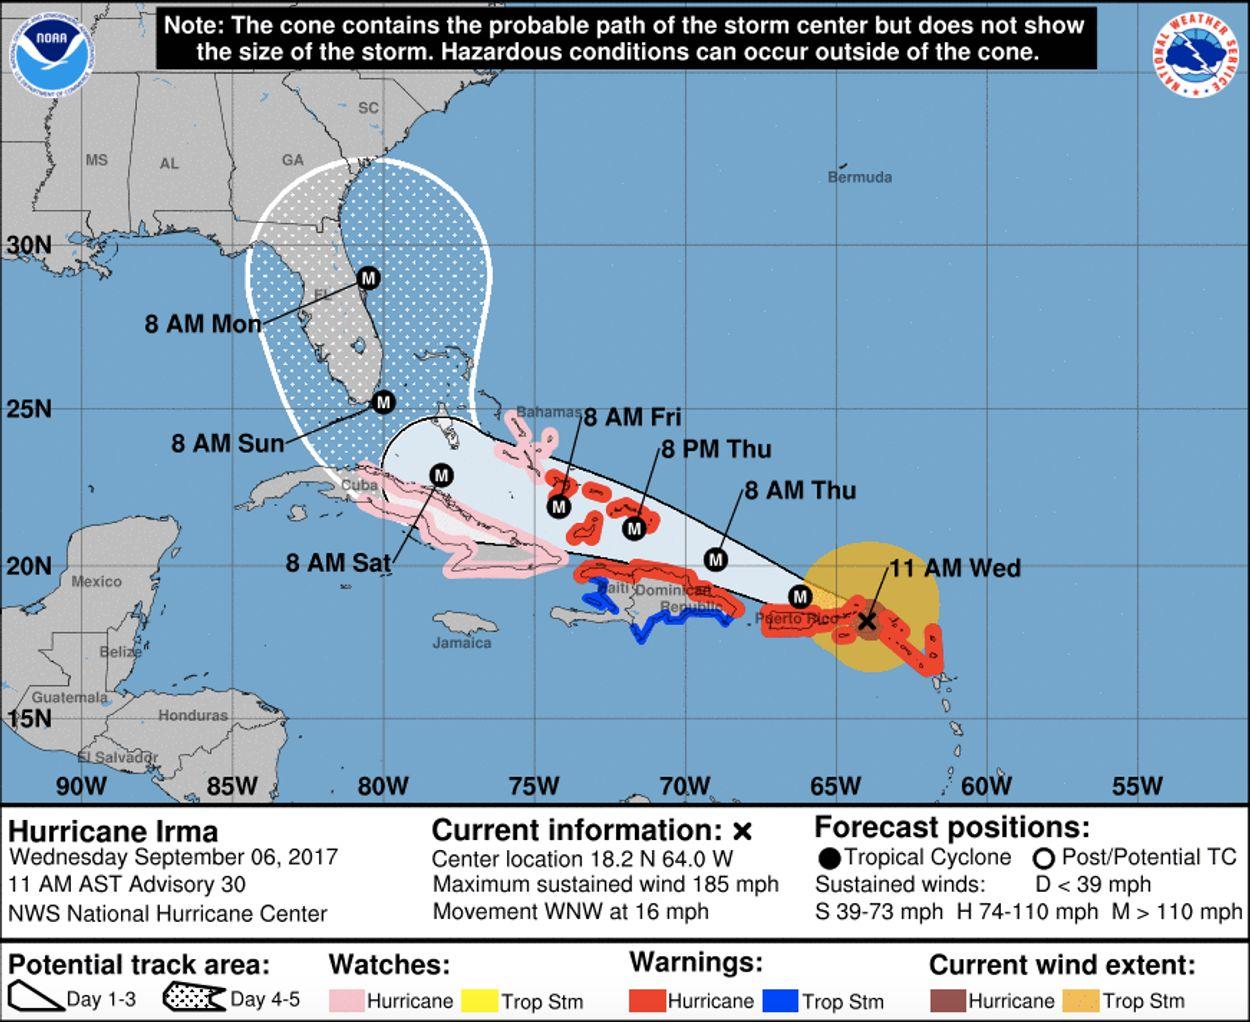 voorspelling Amerikaans orkaancentrum